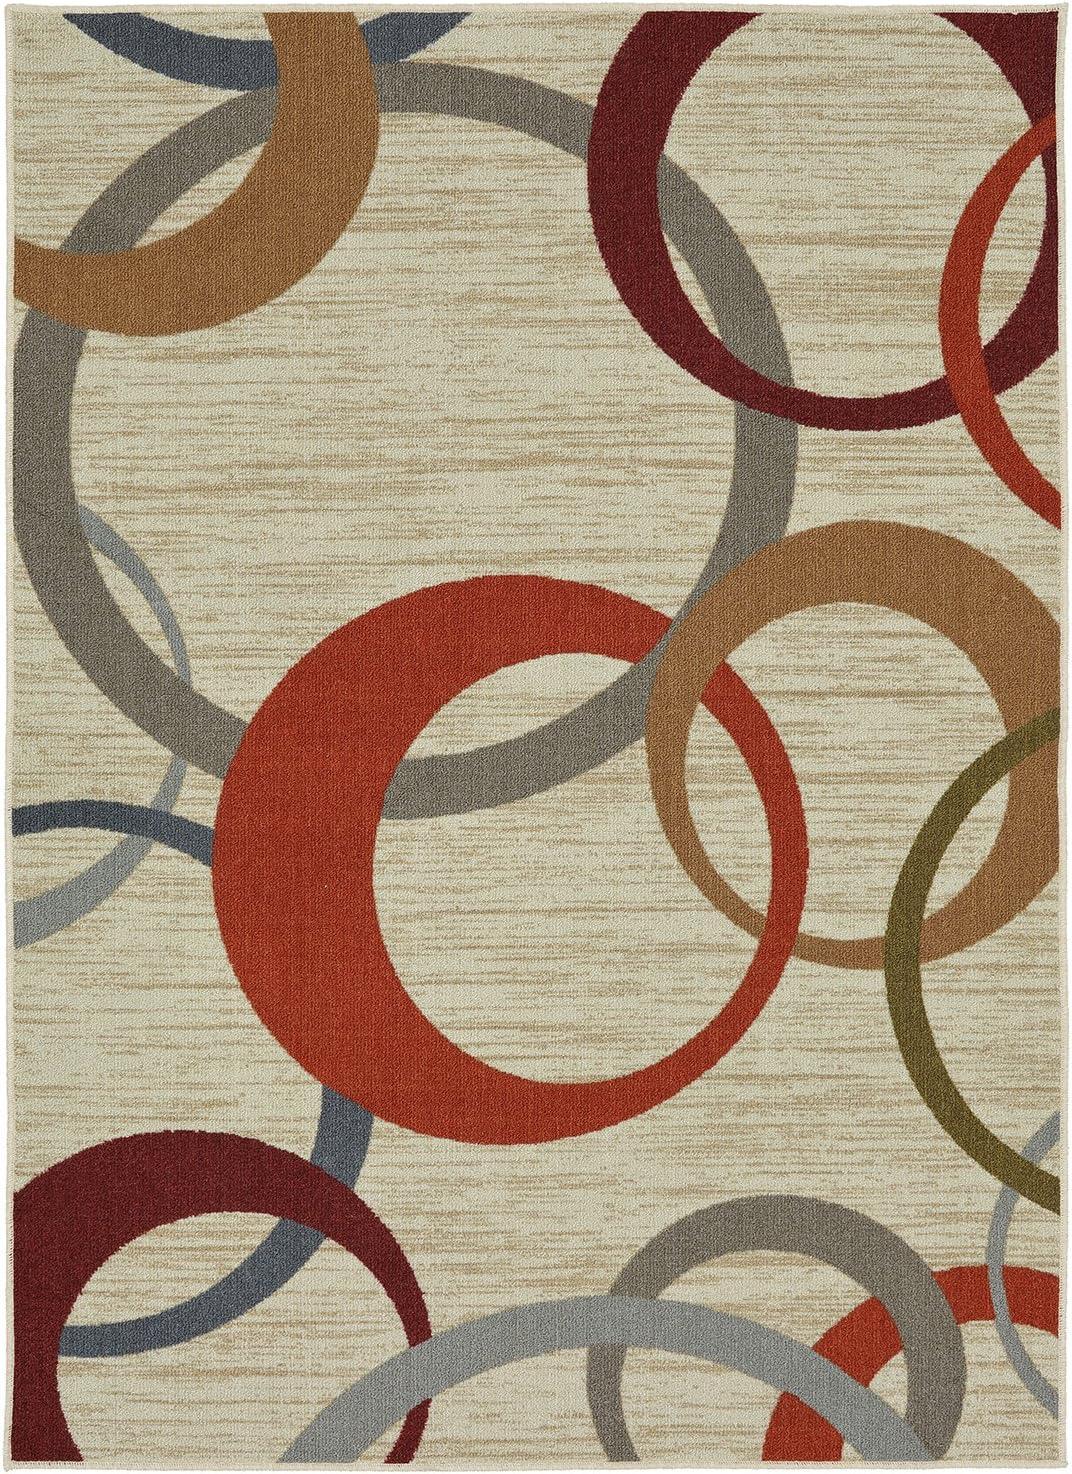 Mohawk Home Soho Picturale Rainbow Geometric Printed Area Rug, 5'x7', Tan